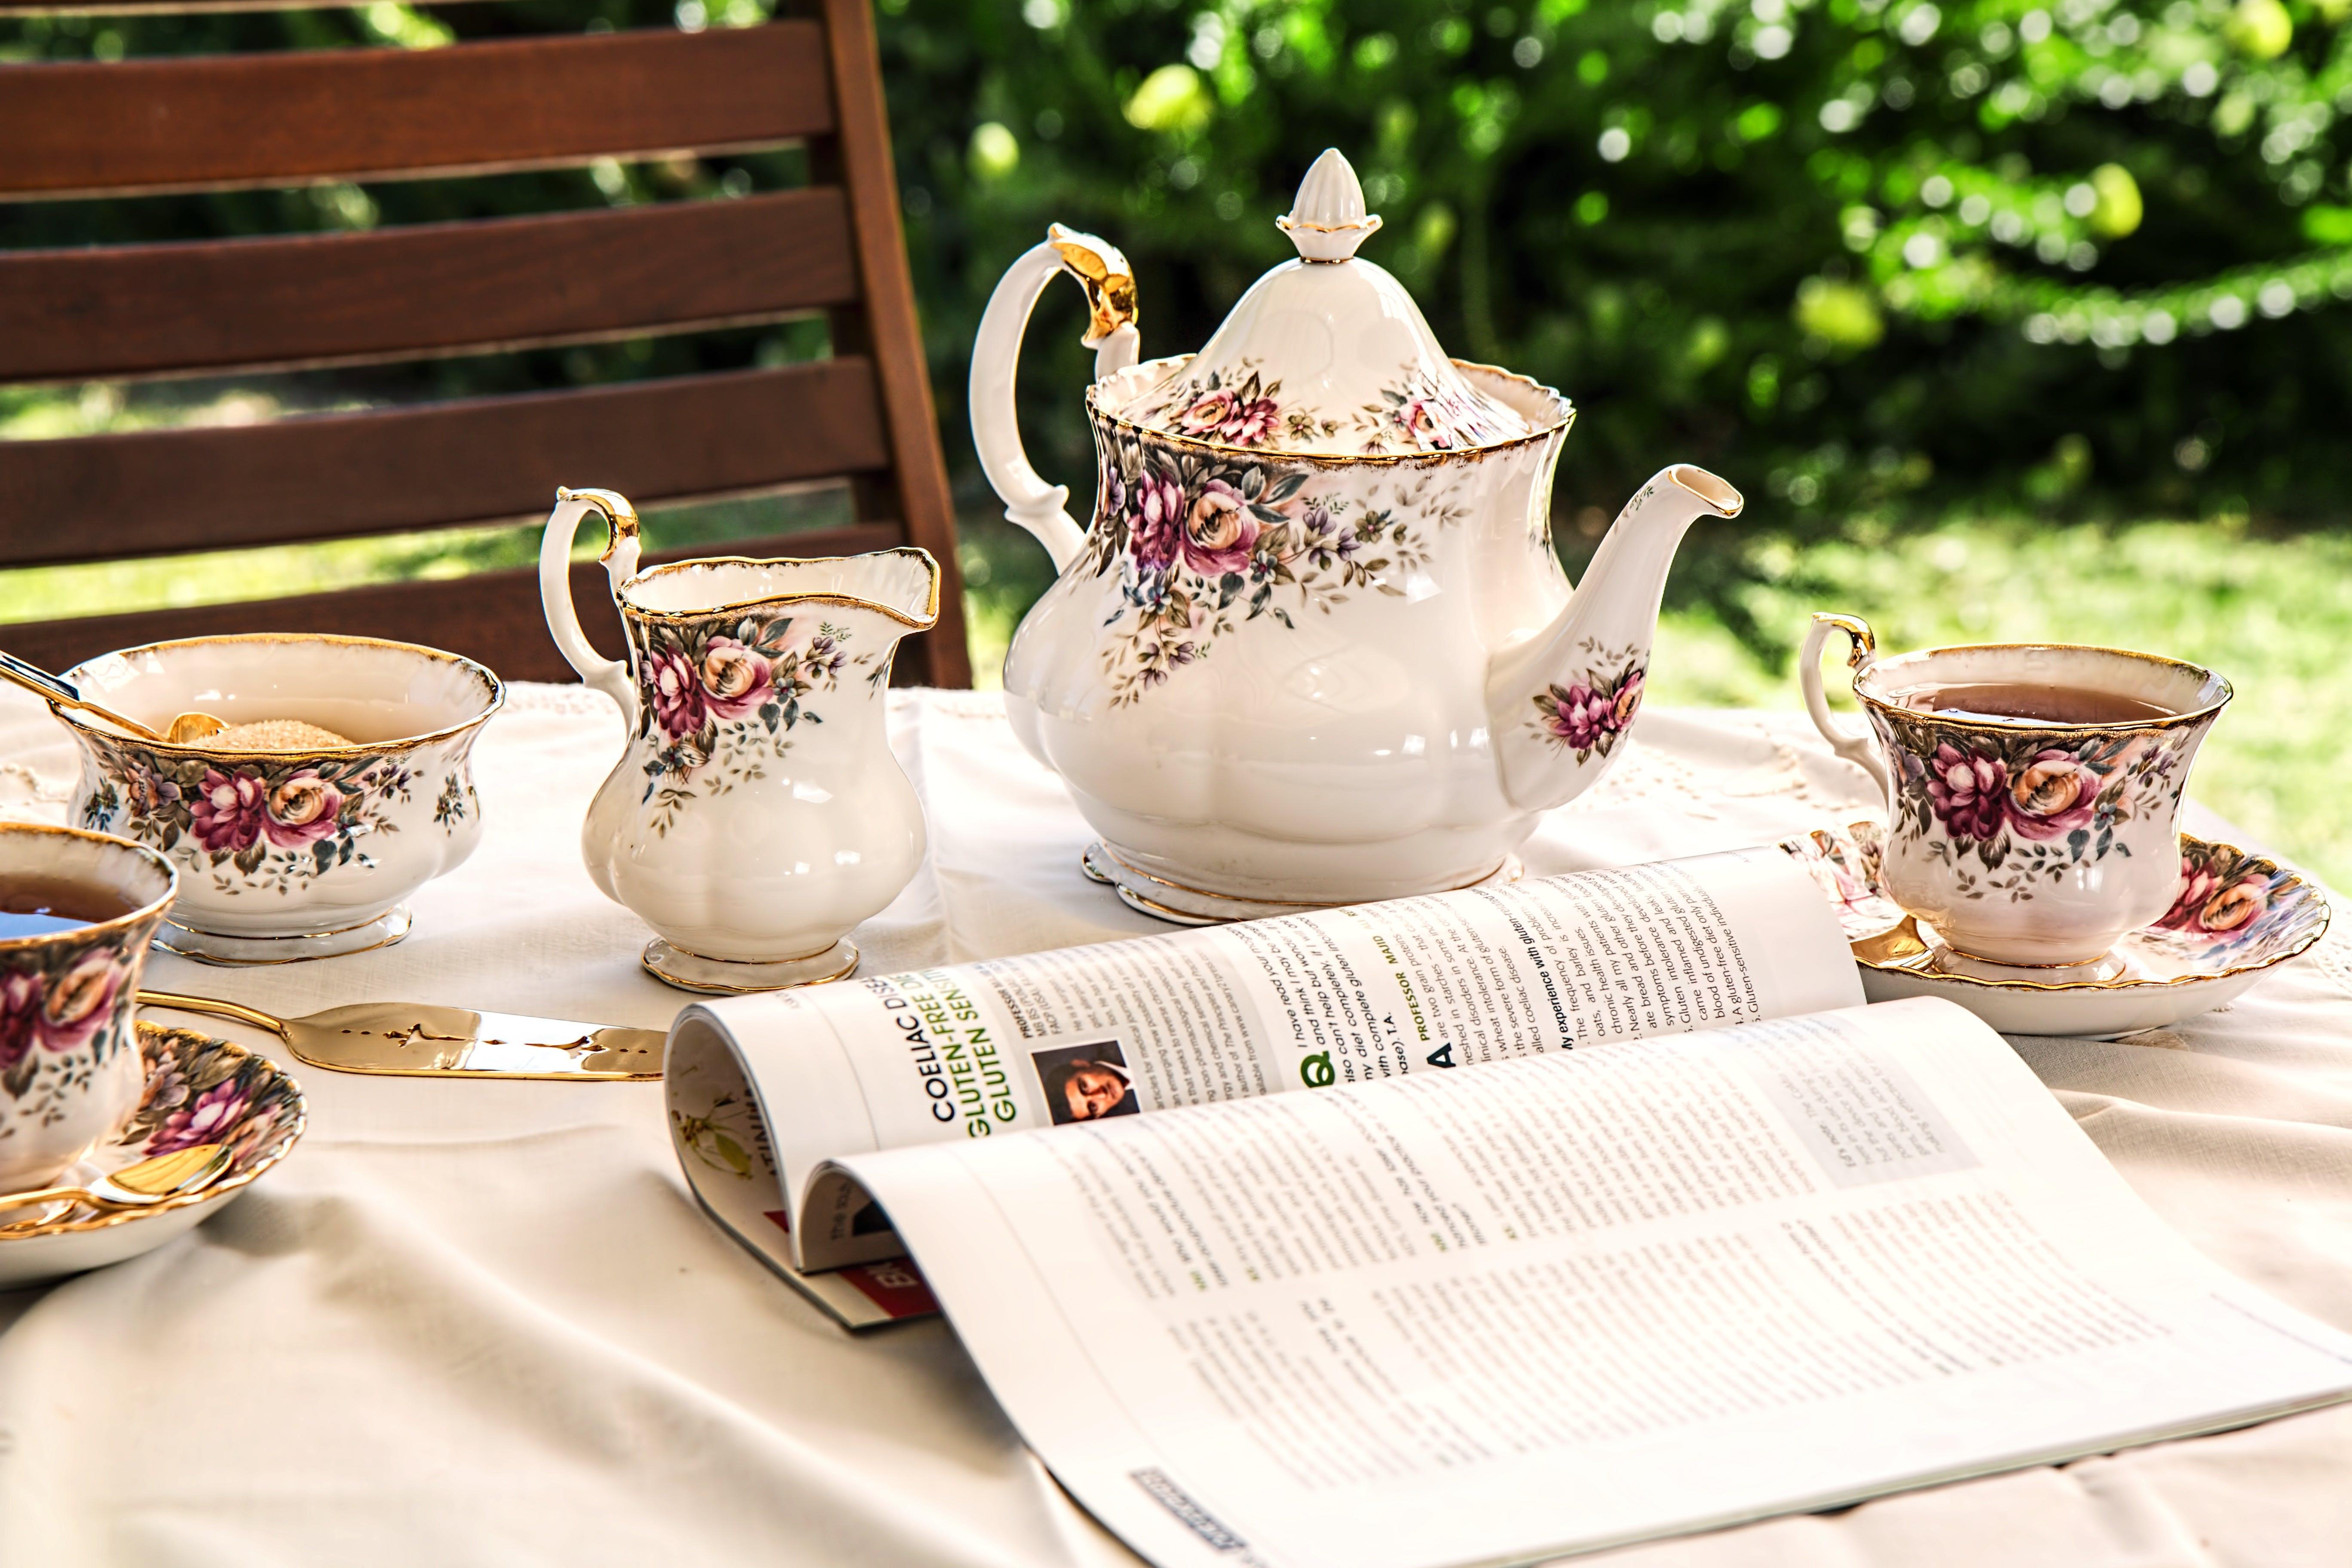 White And Pink Floral Ceramic Tea Set On White Textile